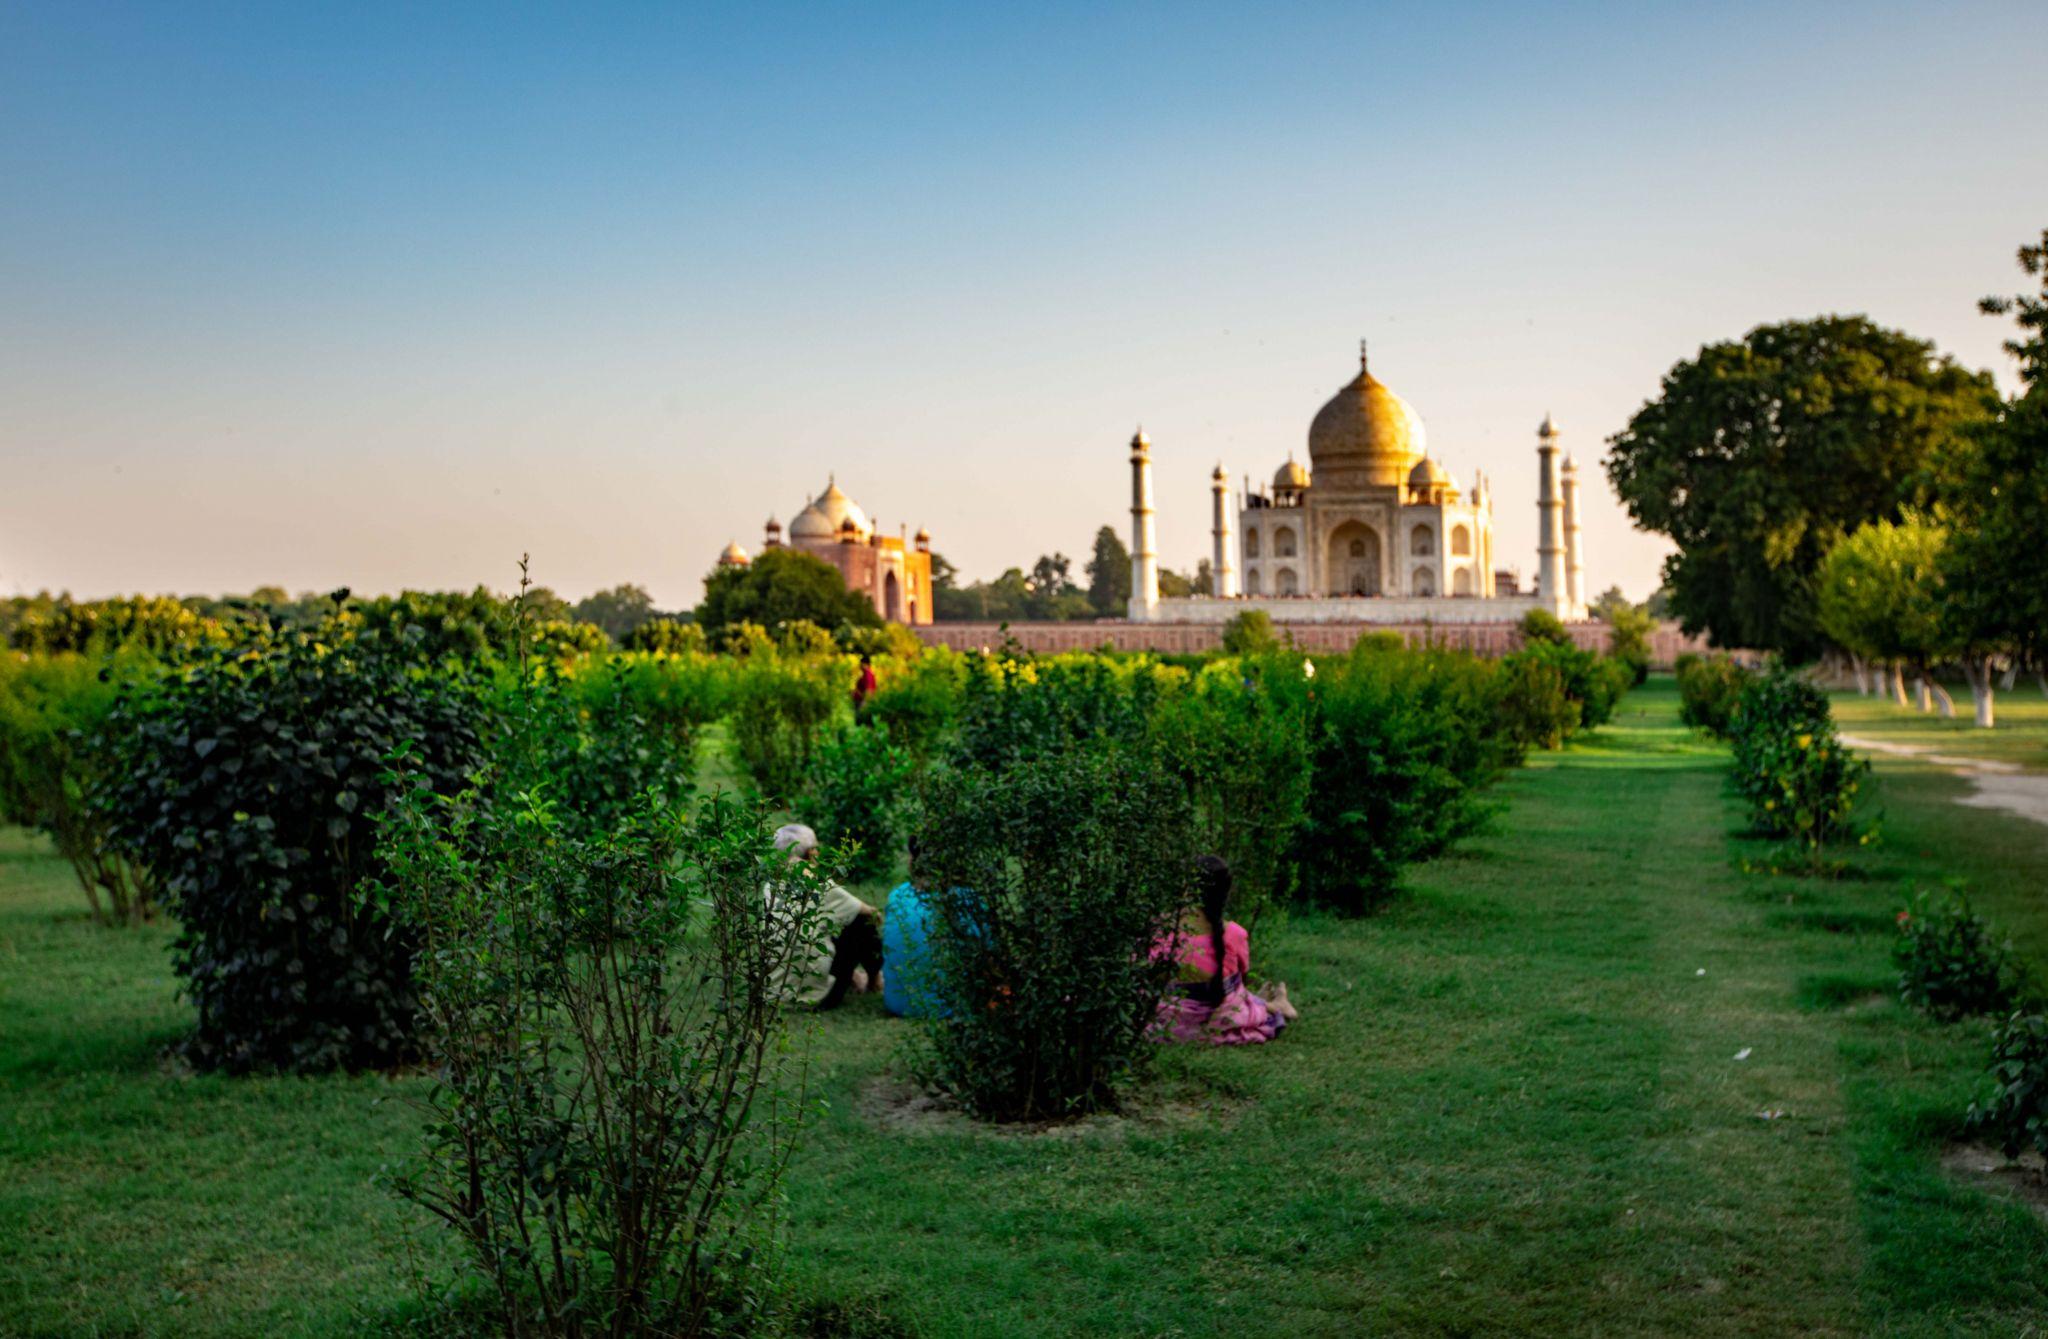 Mughal-era gardens, Taj Mahal sunset, Agra, India